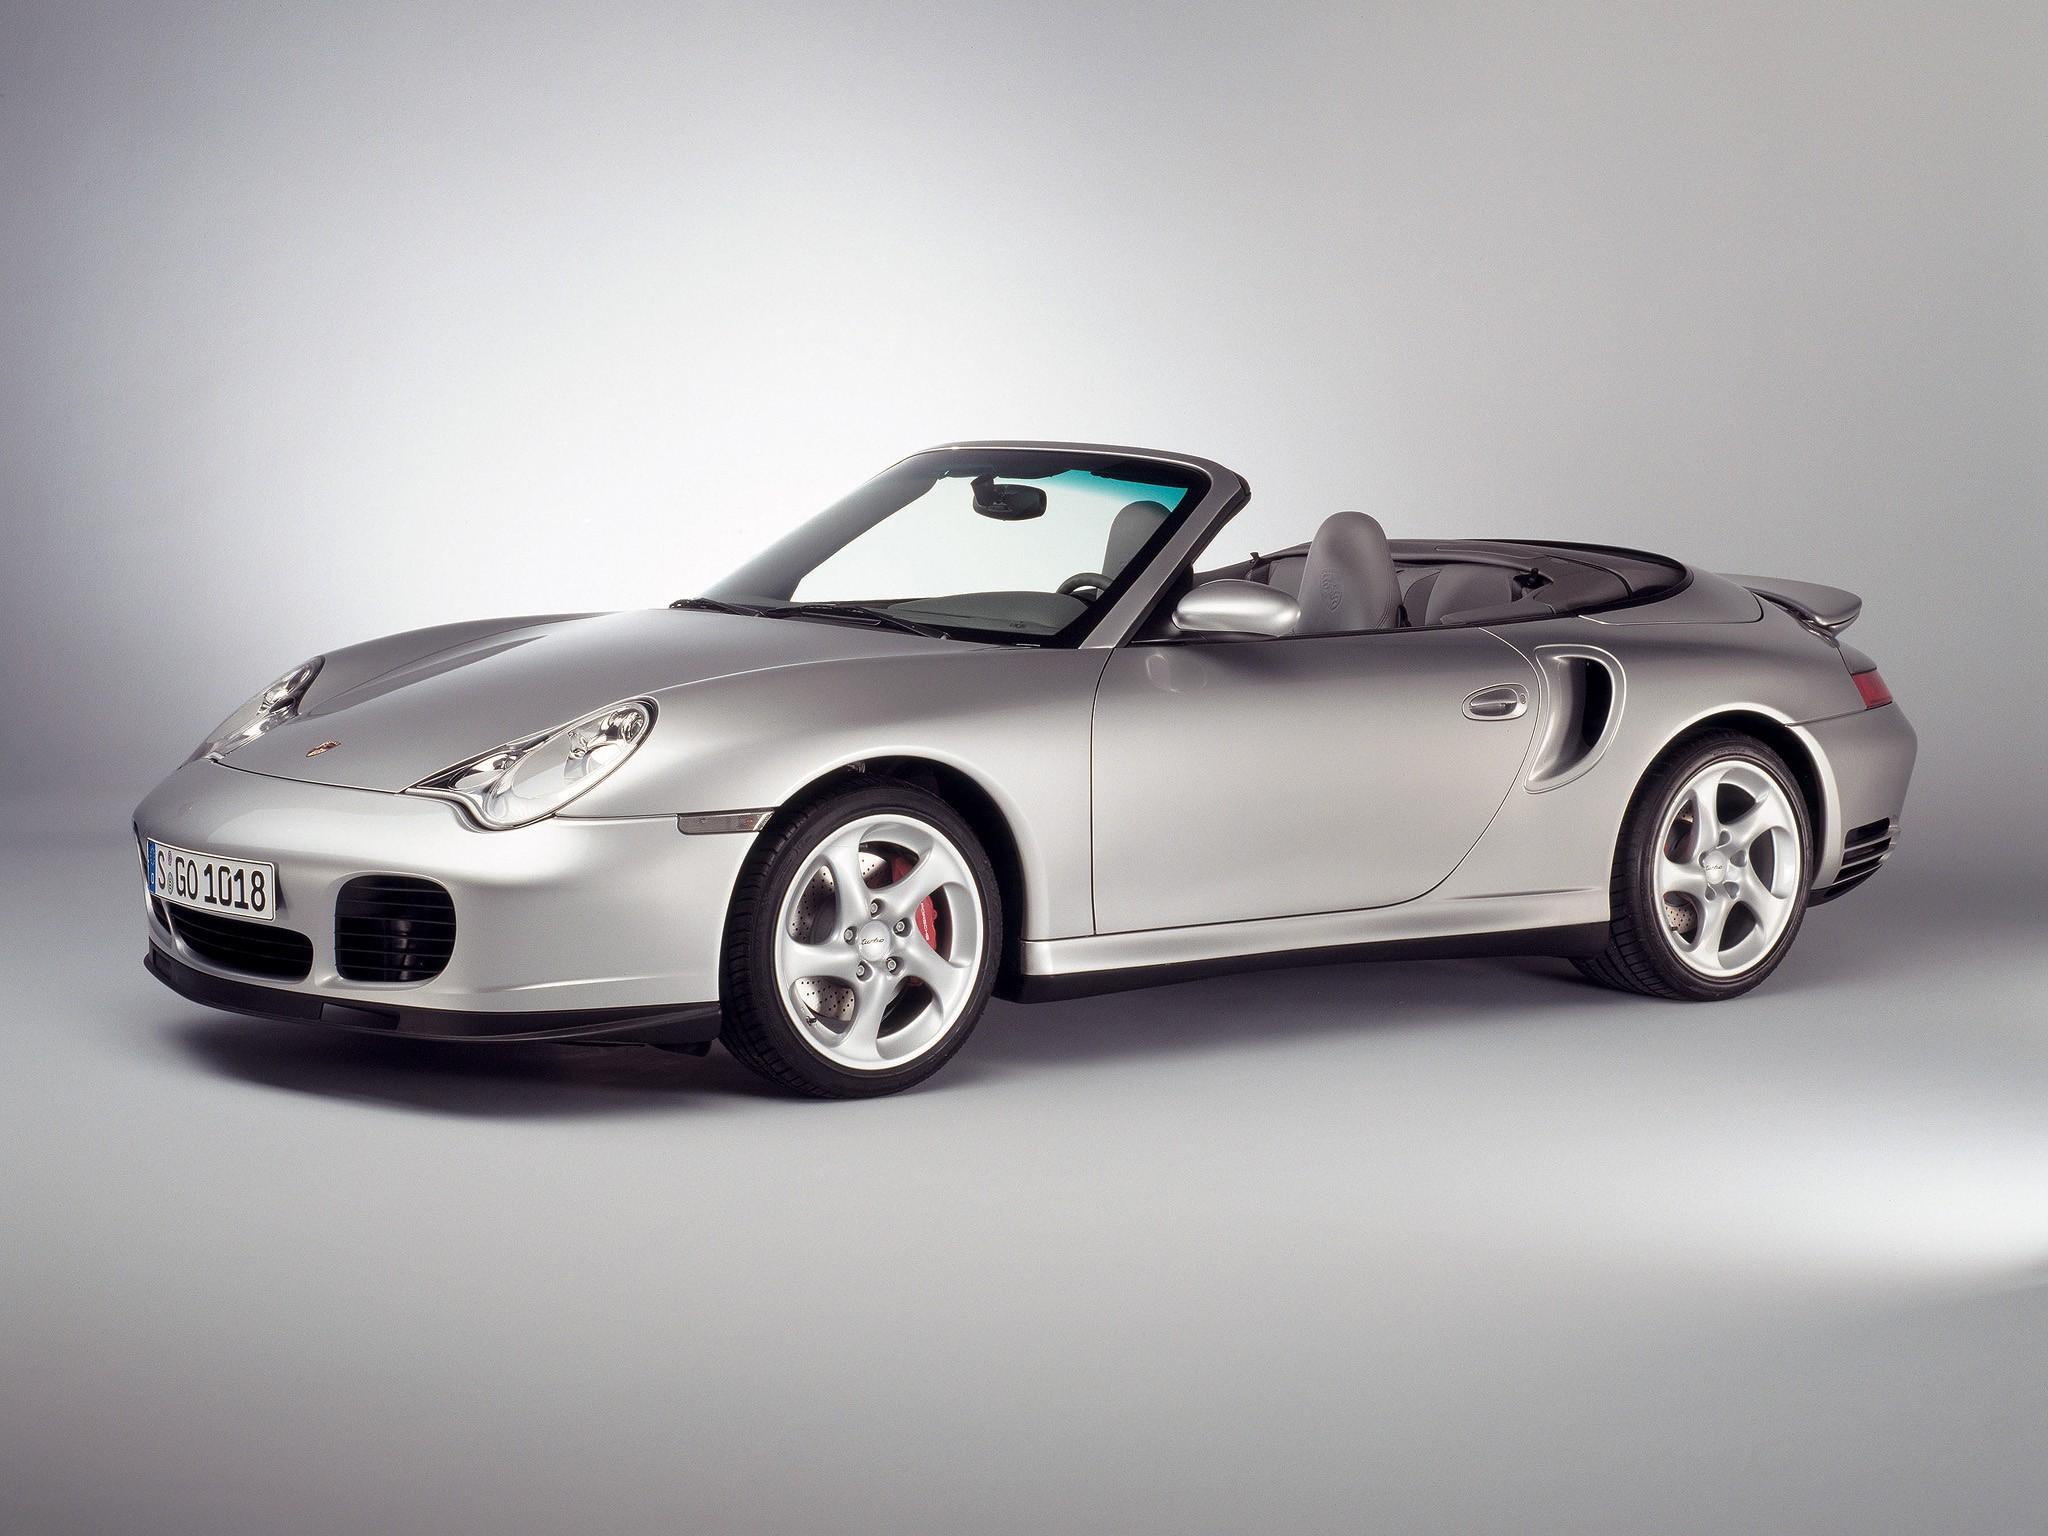 porsche 911 turbo cabriolet 996 2004 2005 2006 2007 autoevolution. Black Bedroom Furniture Sets. Home Design Ideas